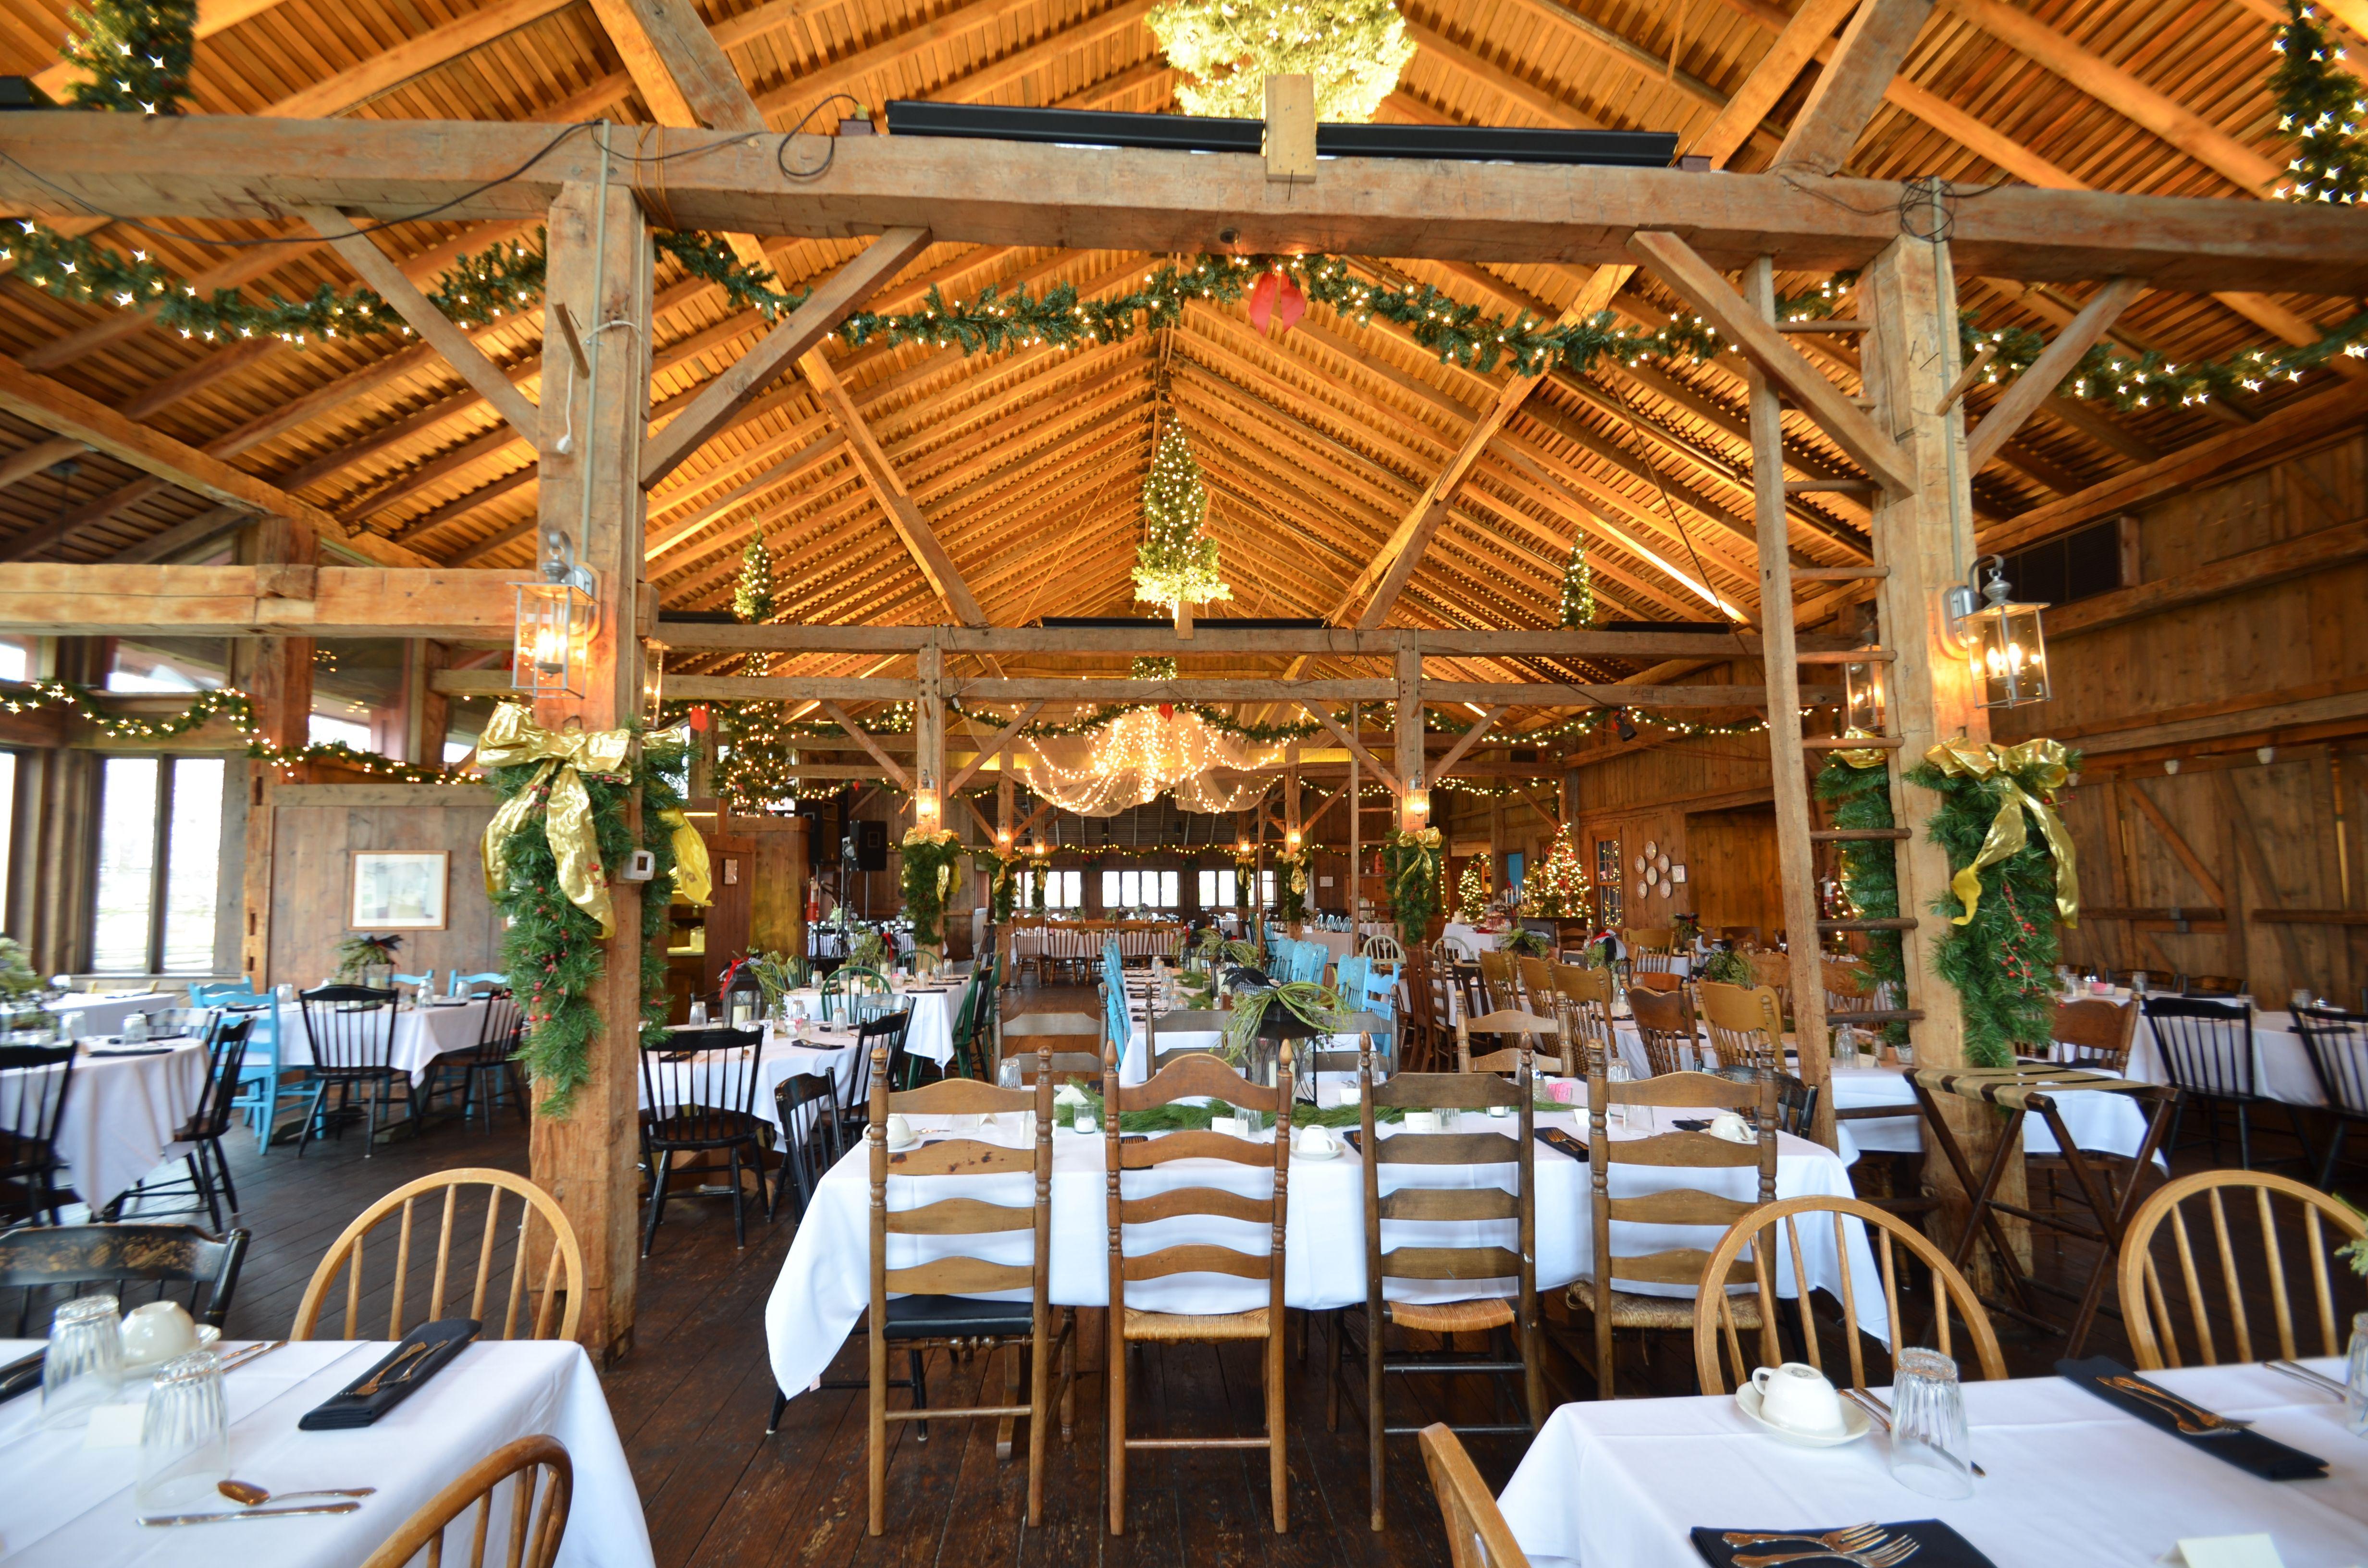 Winter Barn Wedding Amish Acres Weddings Receptions Nappanee Indiana